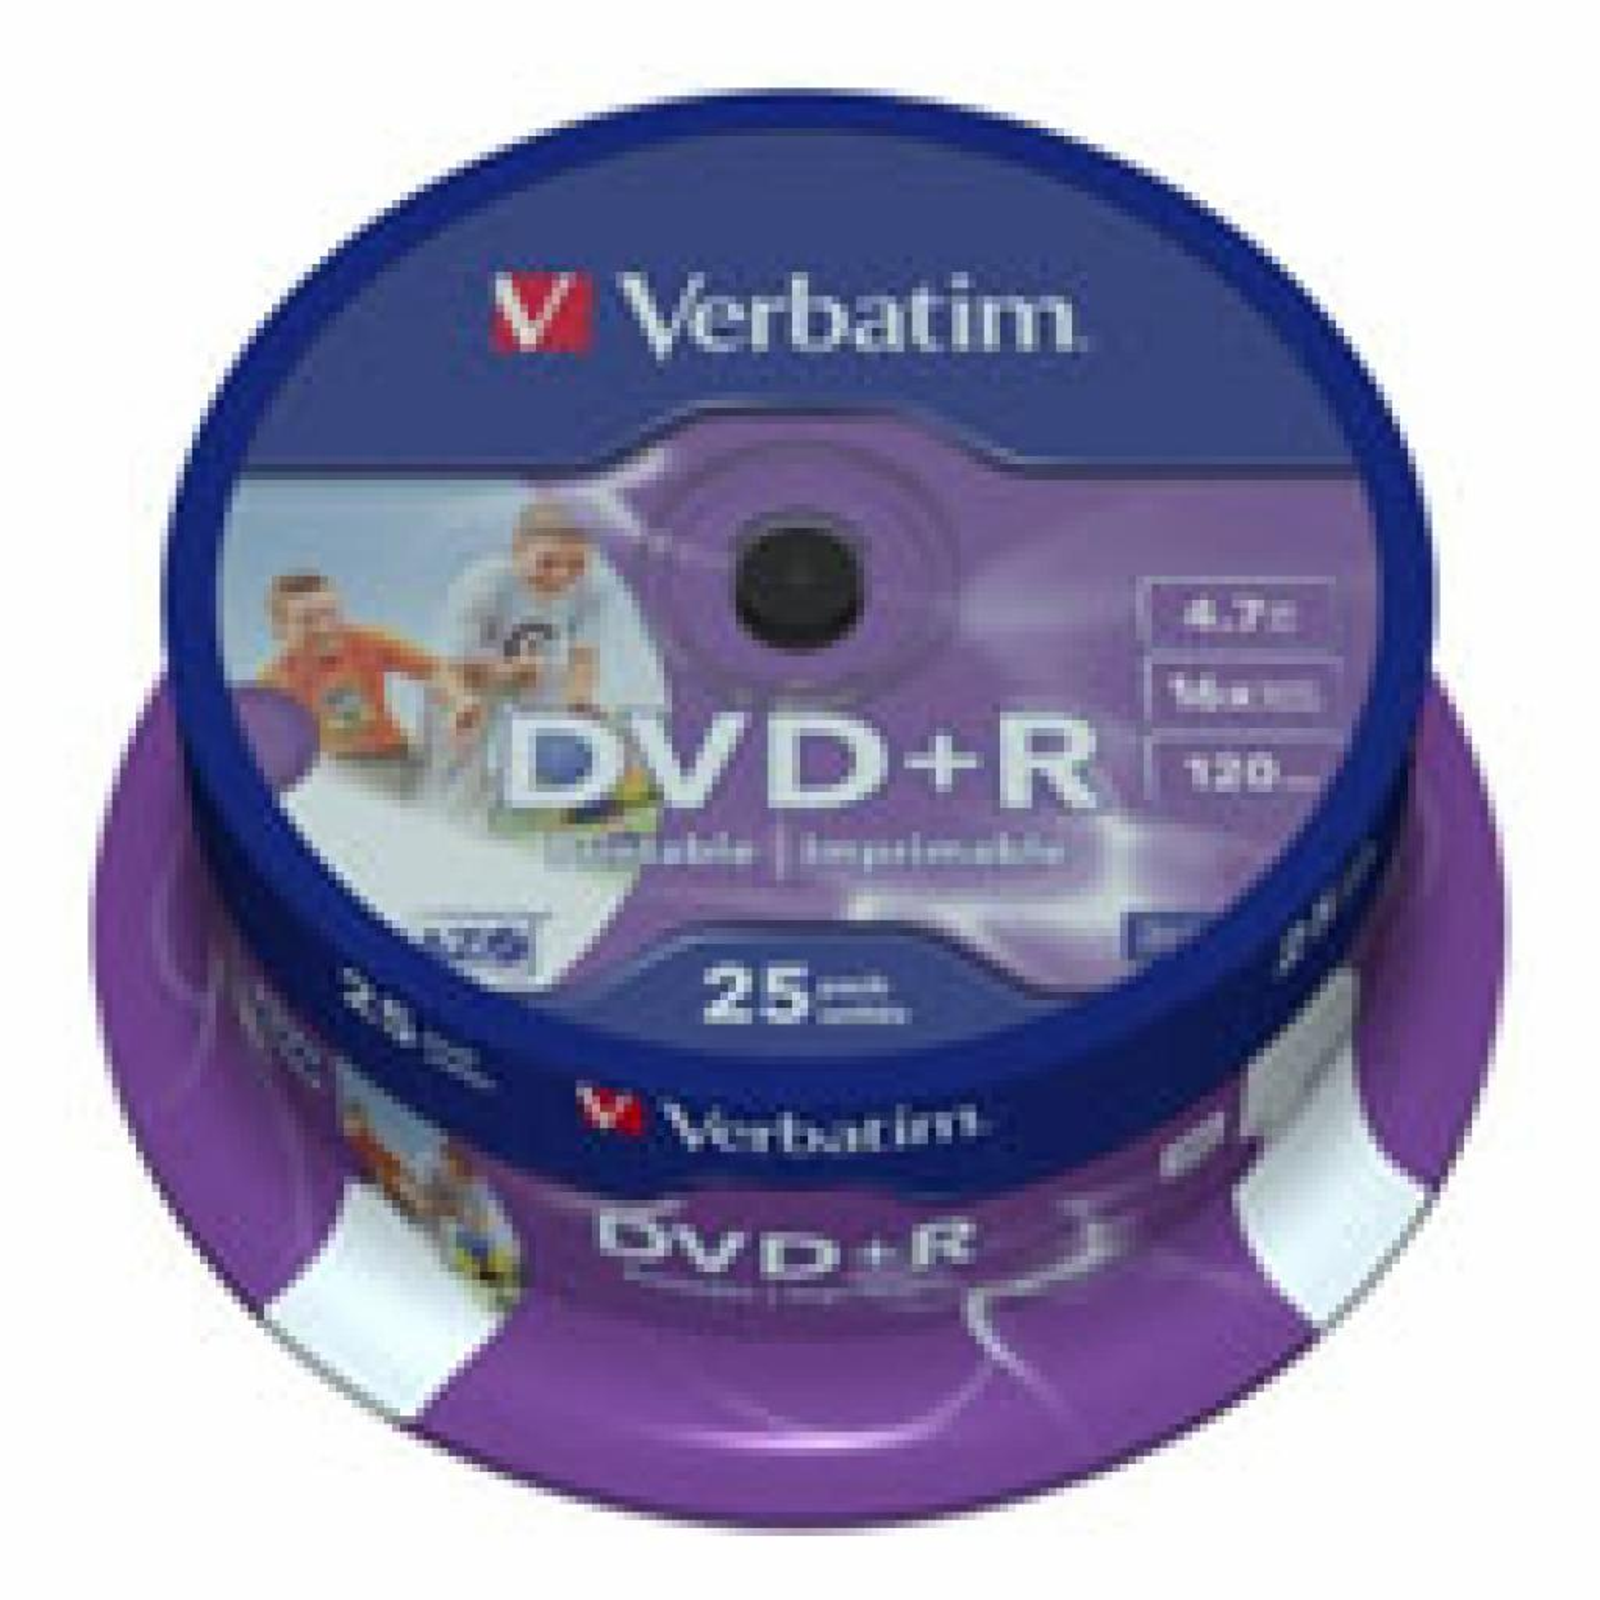 Диск DVD+R Verbatim 4.7Gb 16X CakeBox 25шт Silver (43500)